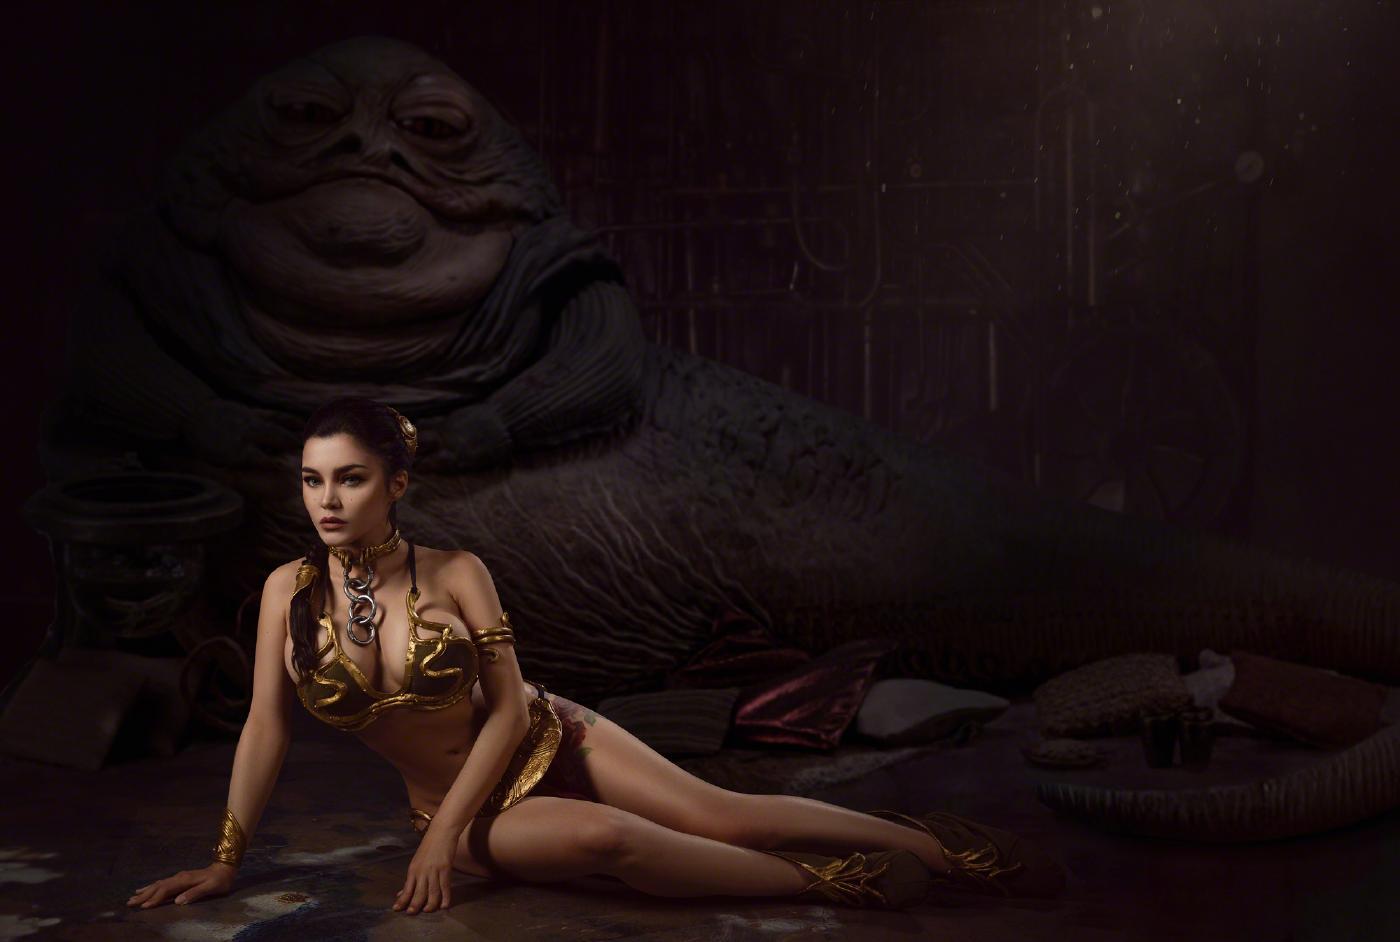 Kalinka Fox Princess Leia Slave Cosplay Set Leaked Sbthyw